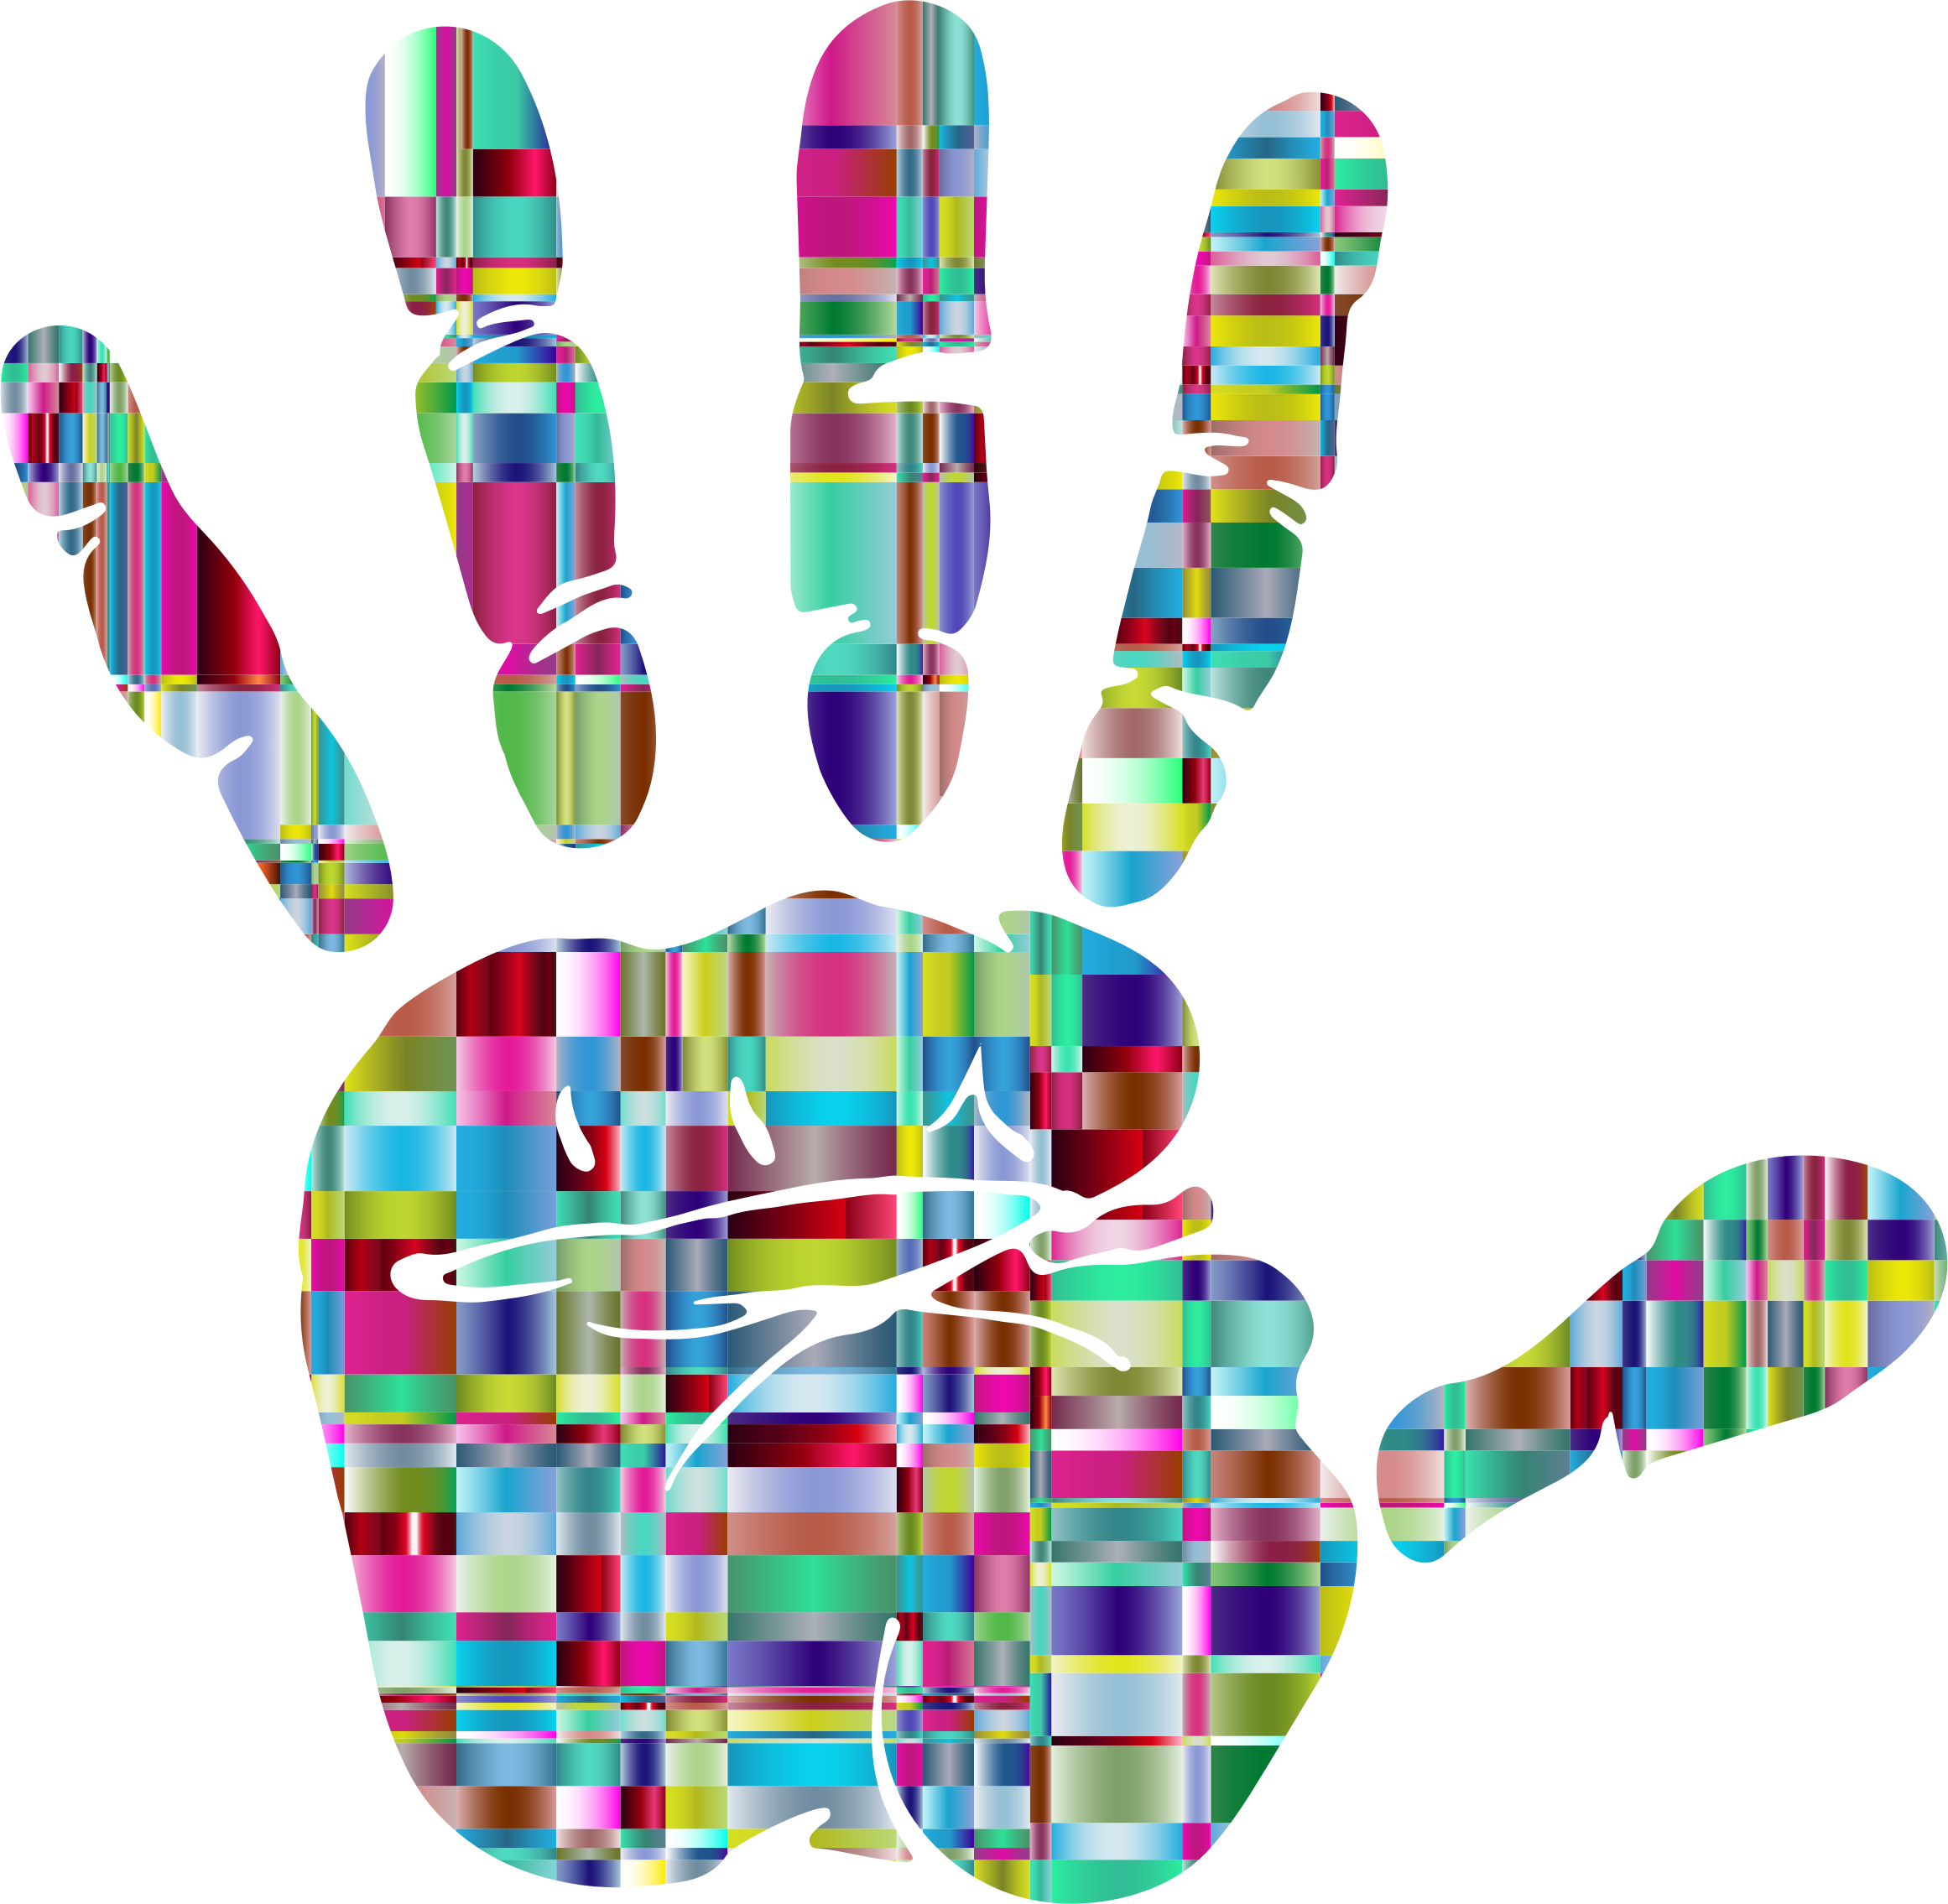 Handprint clipart newborn baby. Prismatic mosaic silhouette icons